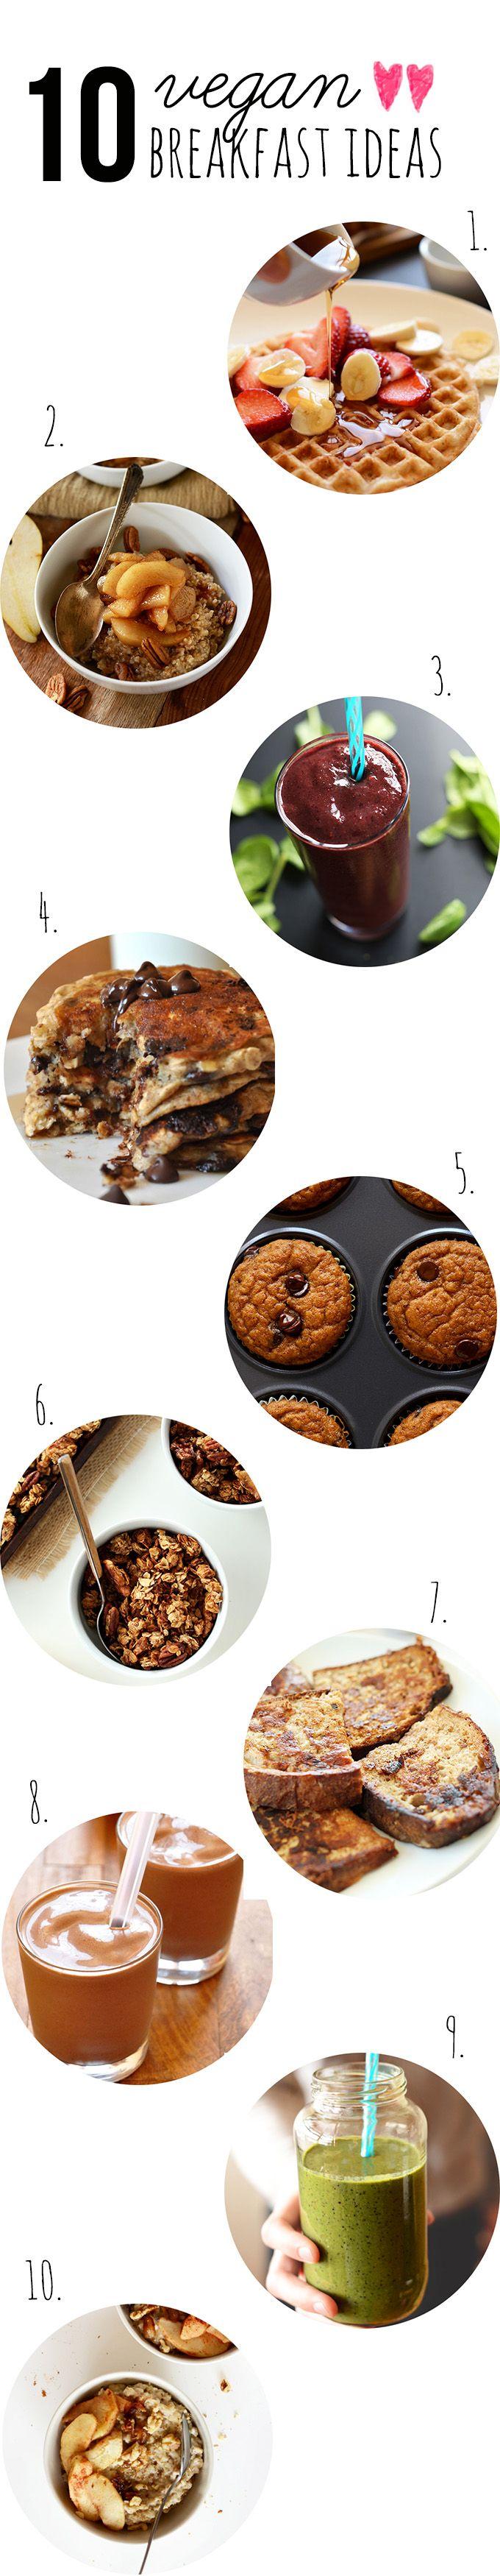 10 Vegan Breakfast Ideas!  via @Dana Shultz | Minimalist Baker